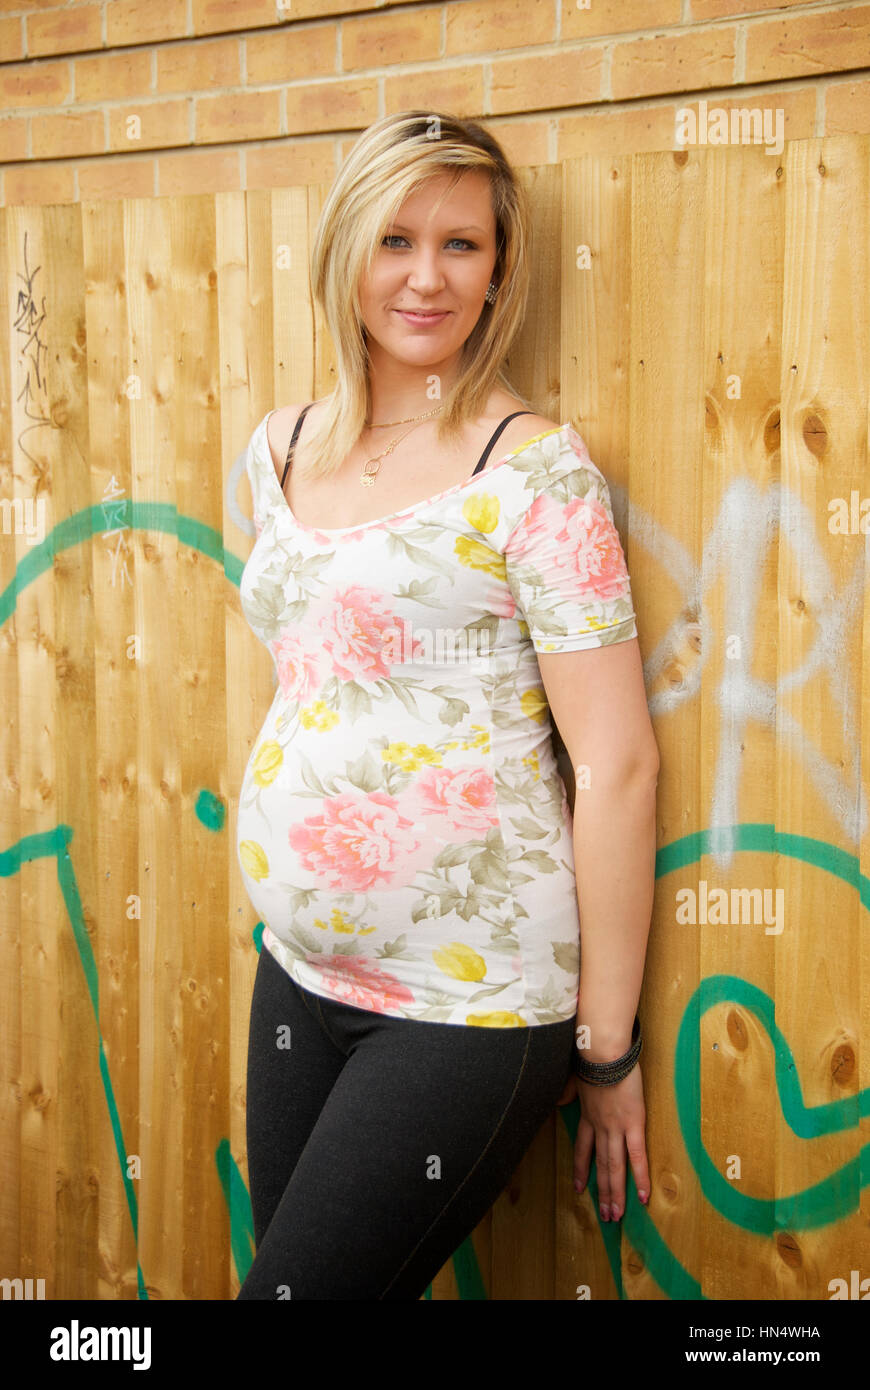 8.5 x 11 Pregnant Girl Next Door FOUND ART PHOTO Pretty Blonde Woman BW 99 25 S